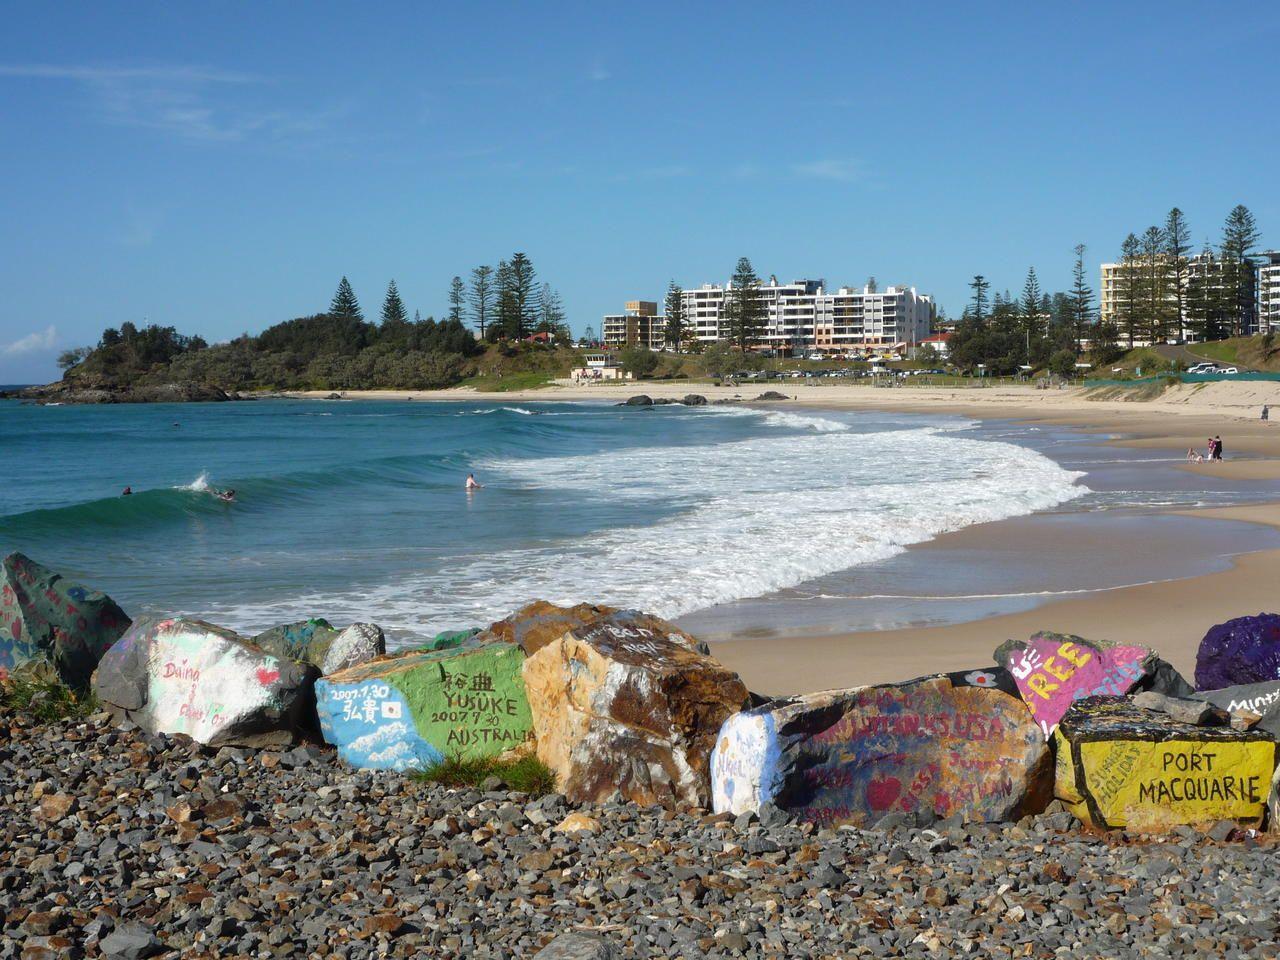 Welcome to Port Macquarie NSW Australia